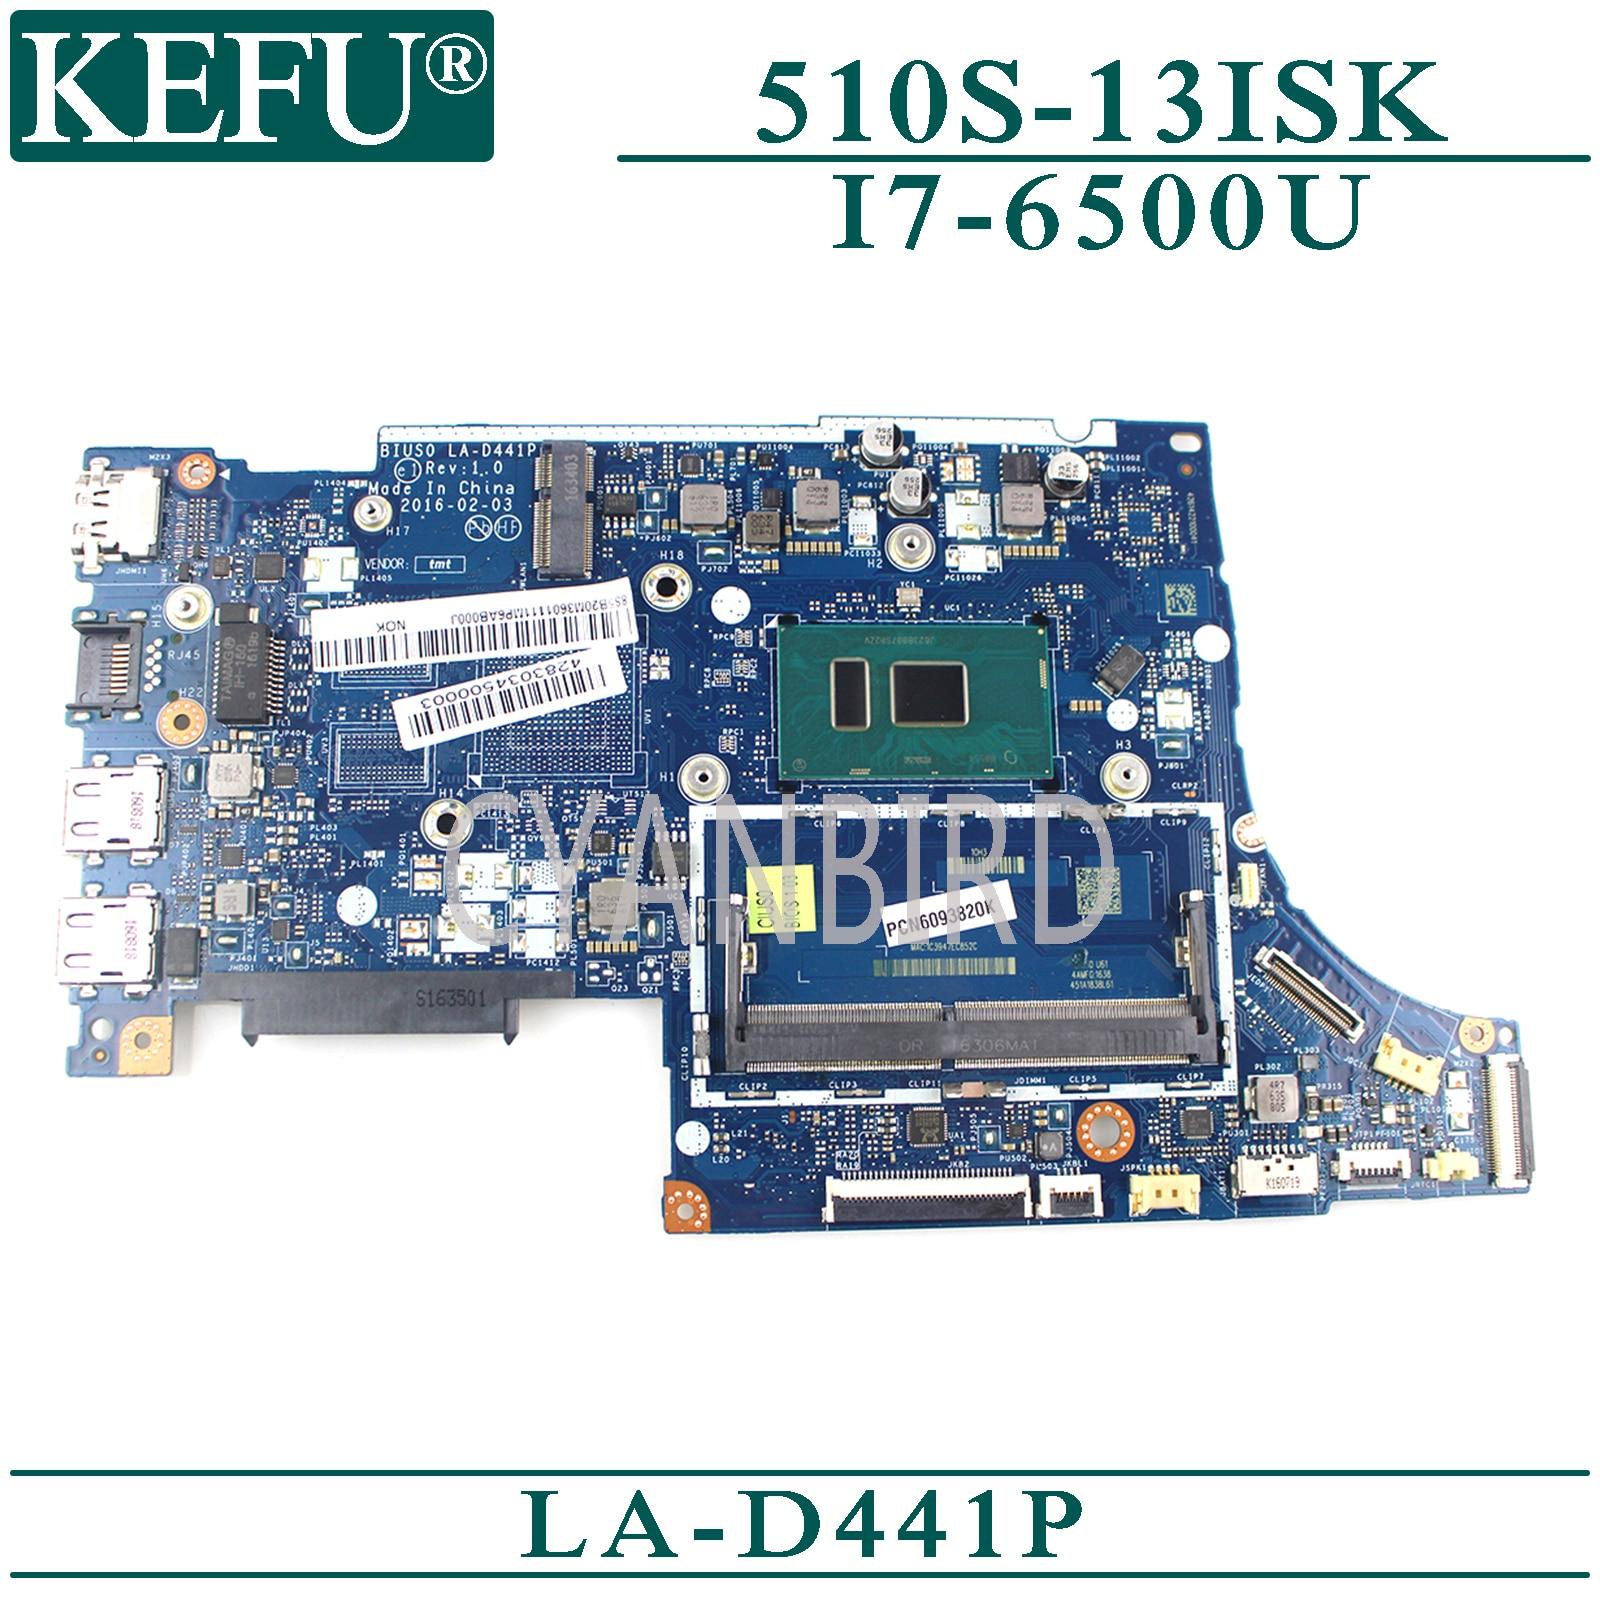 KEFU LA-D441P اللوحة الرئيسية الأصلية لينوفو Ideapad 510S-13ISK مع I7-6500U اللوحة الأم للكمبيوتر المحمول